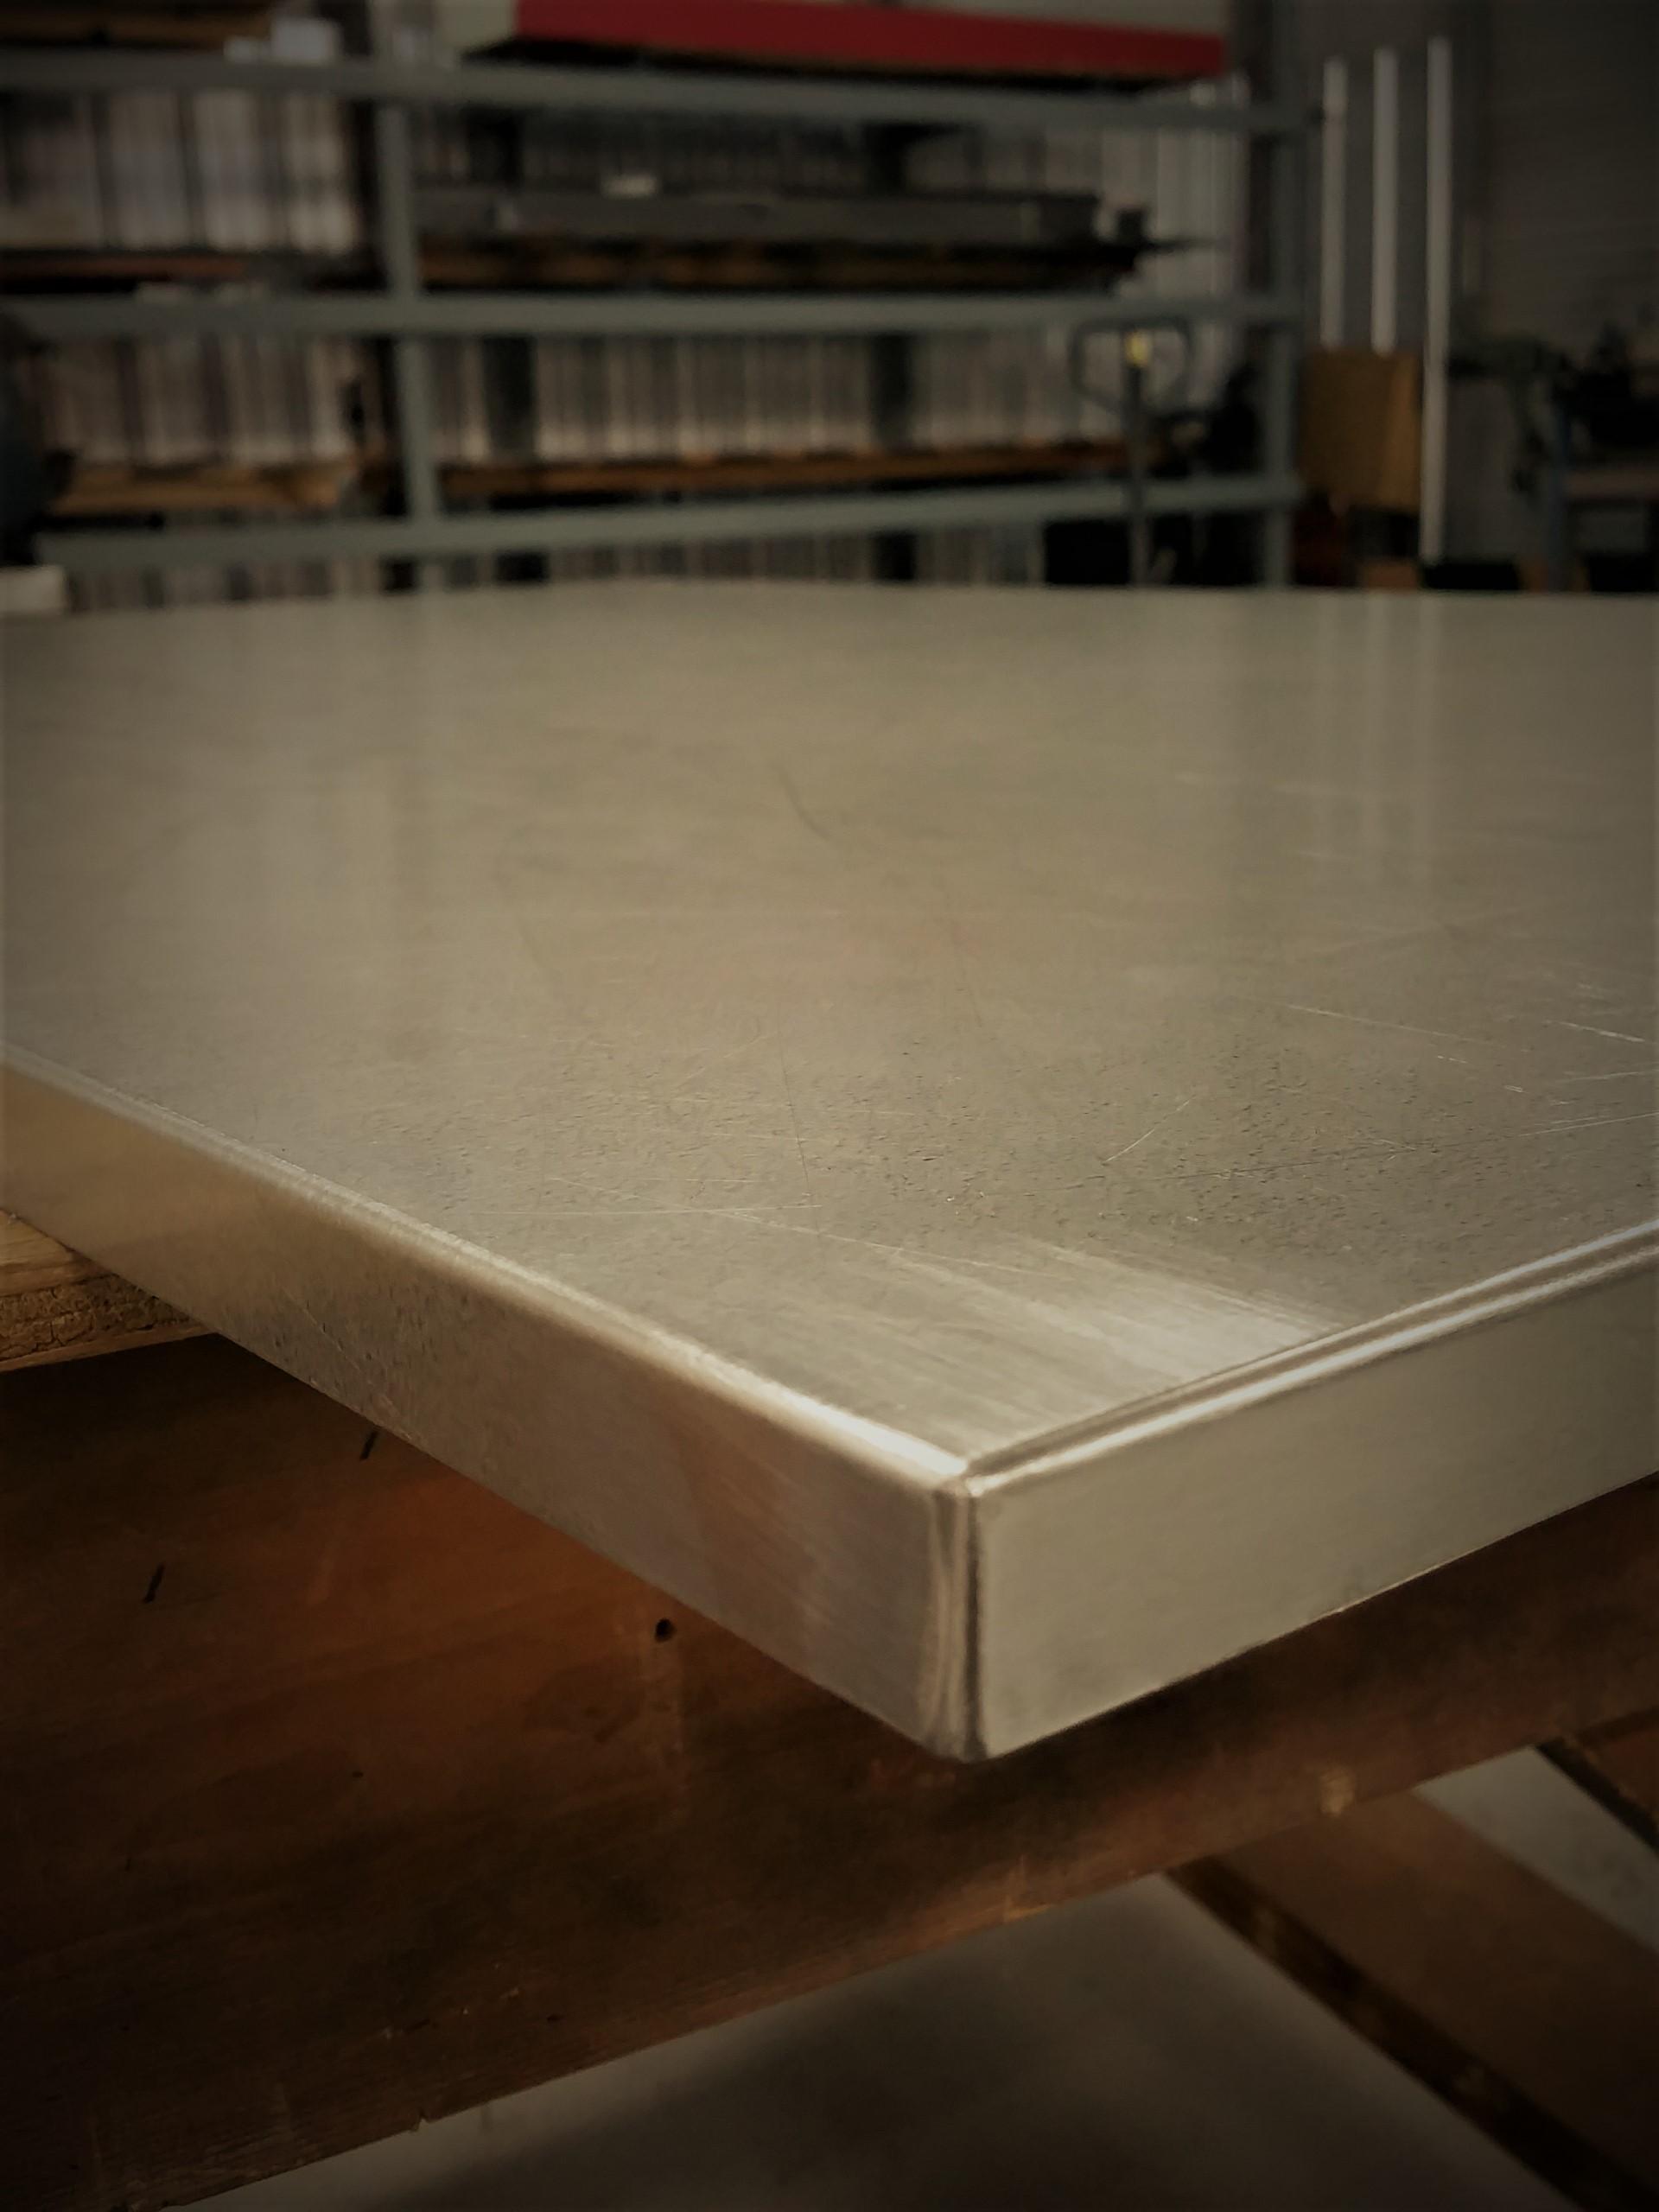 Soldered table top corner